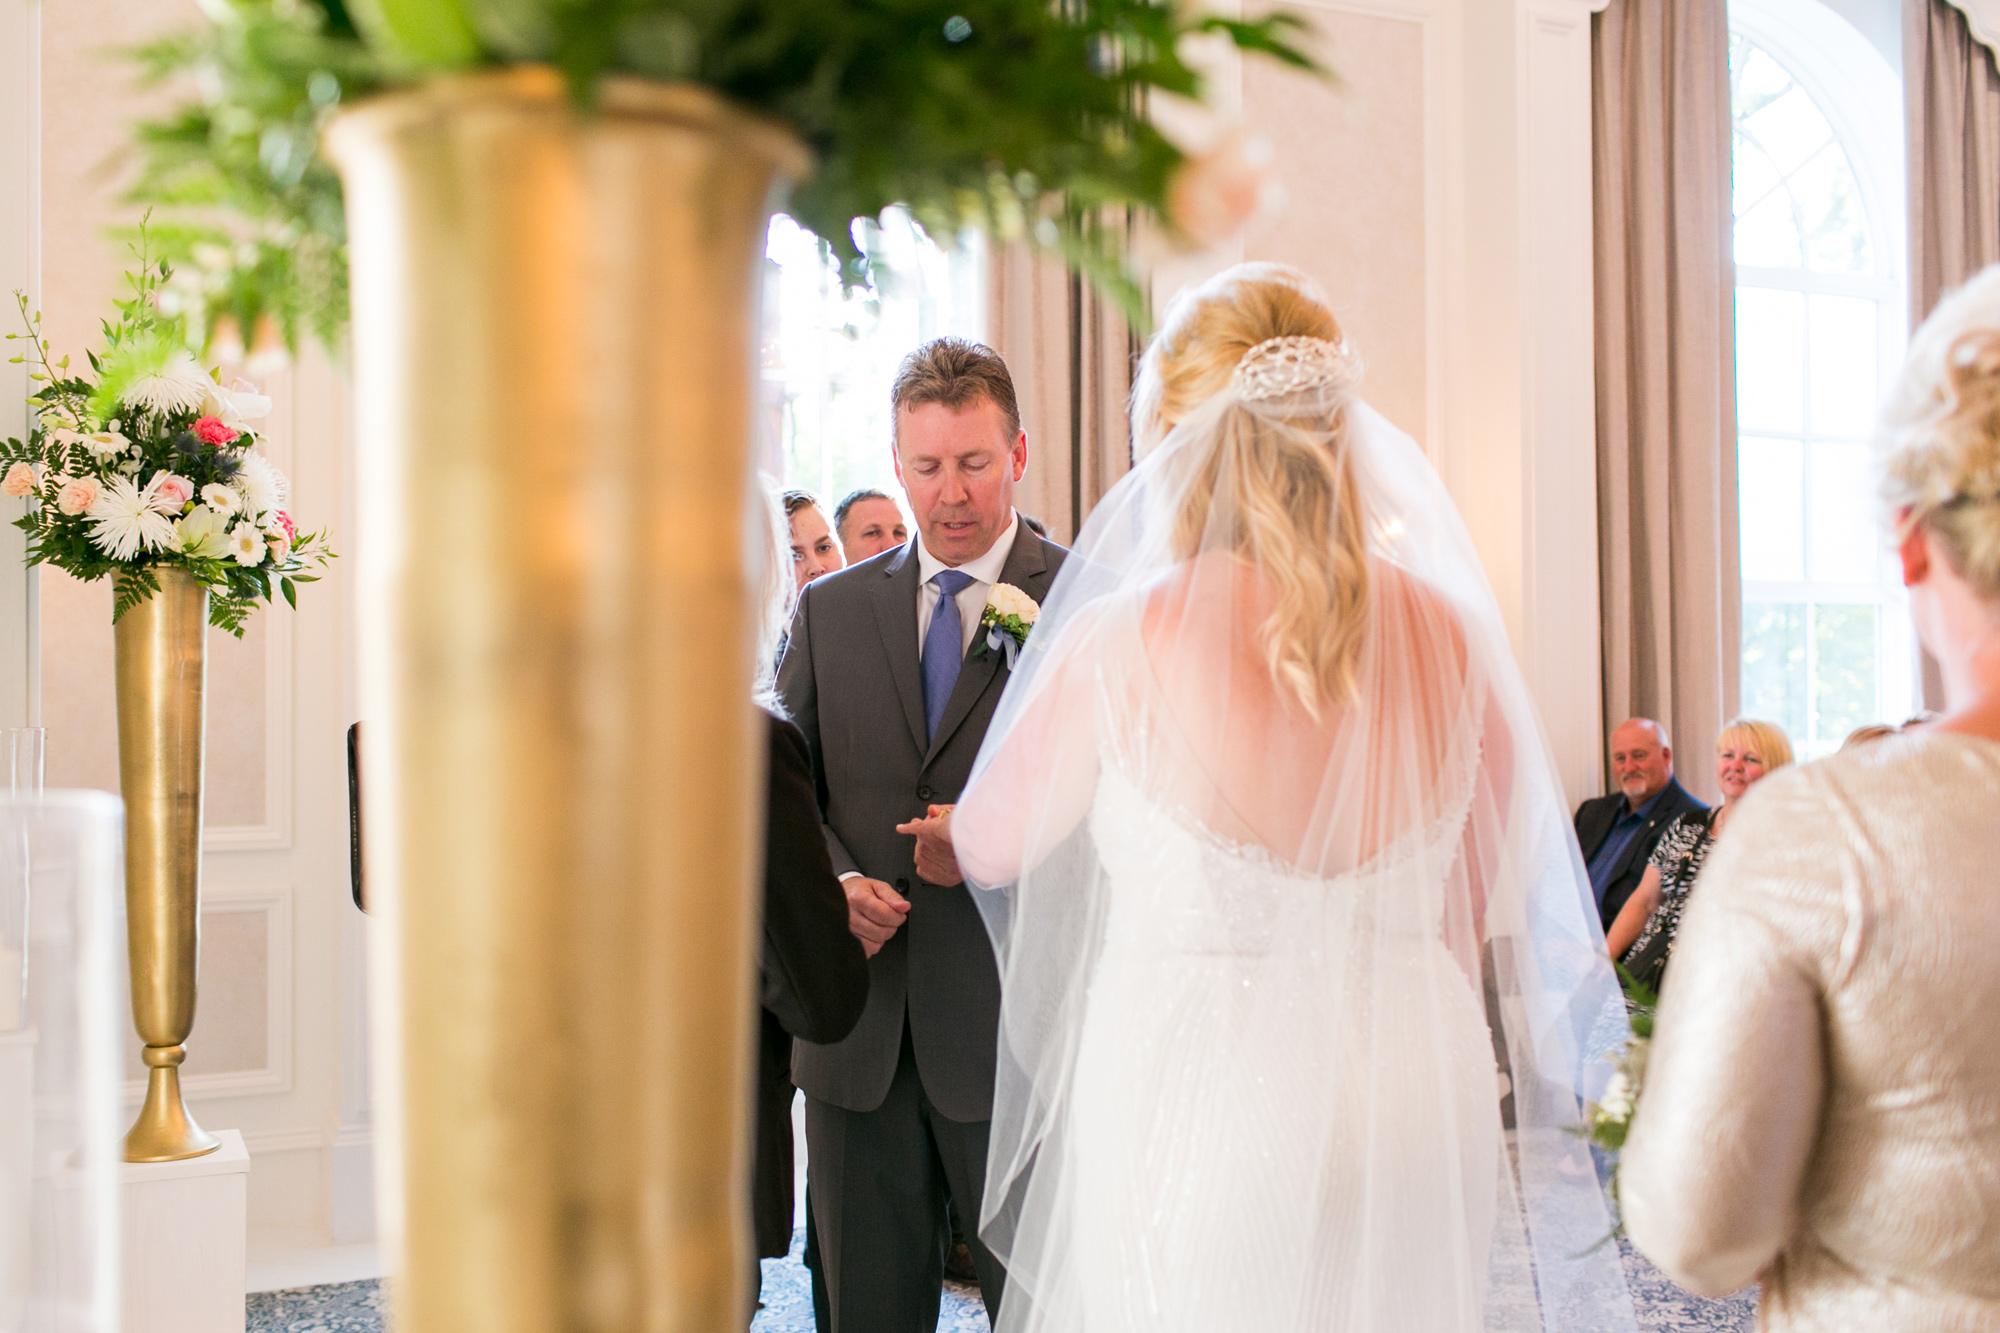 101-lord-nelson-wedding------.jpg